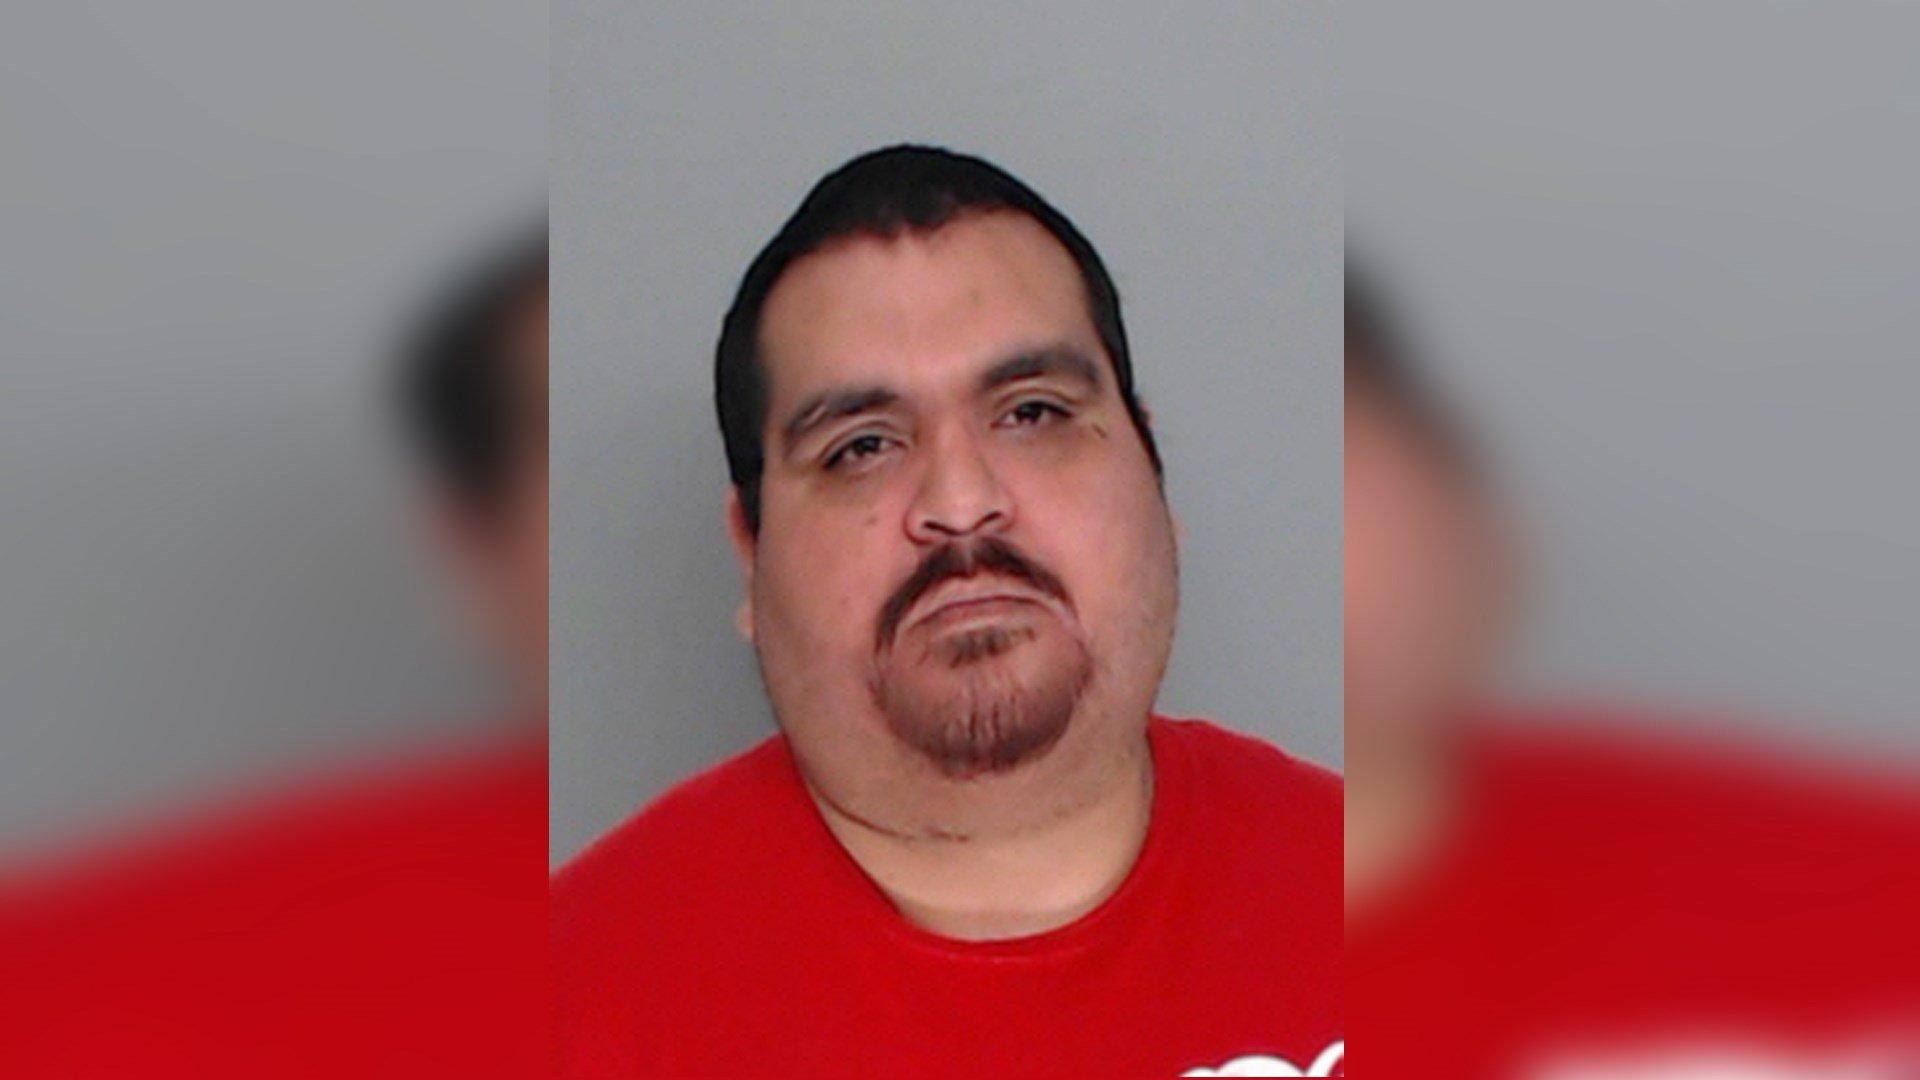 The Texas Rangers are investigating the death of Daniel Emilio Carrillo.